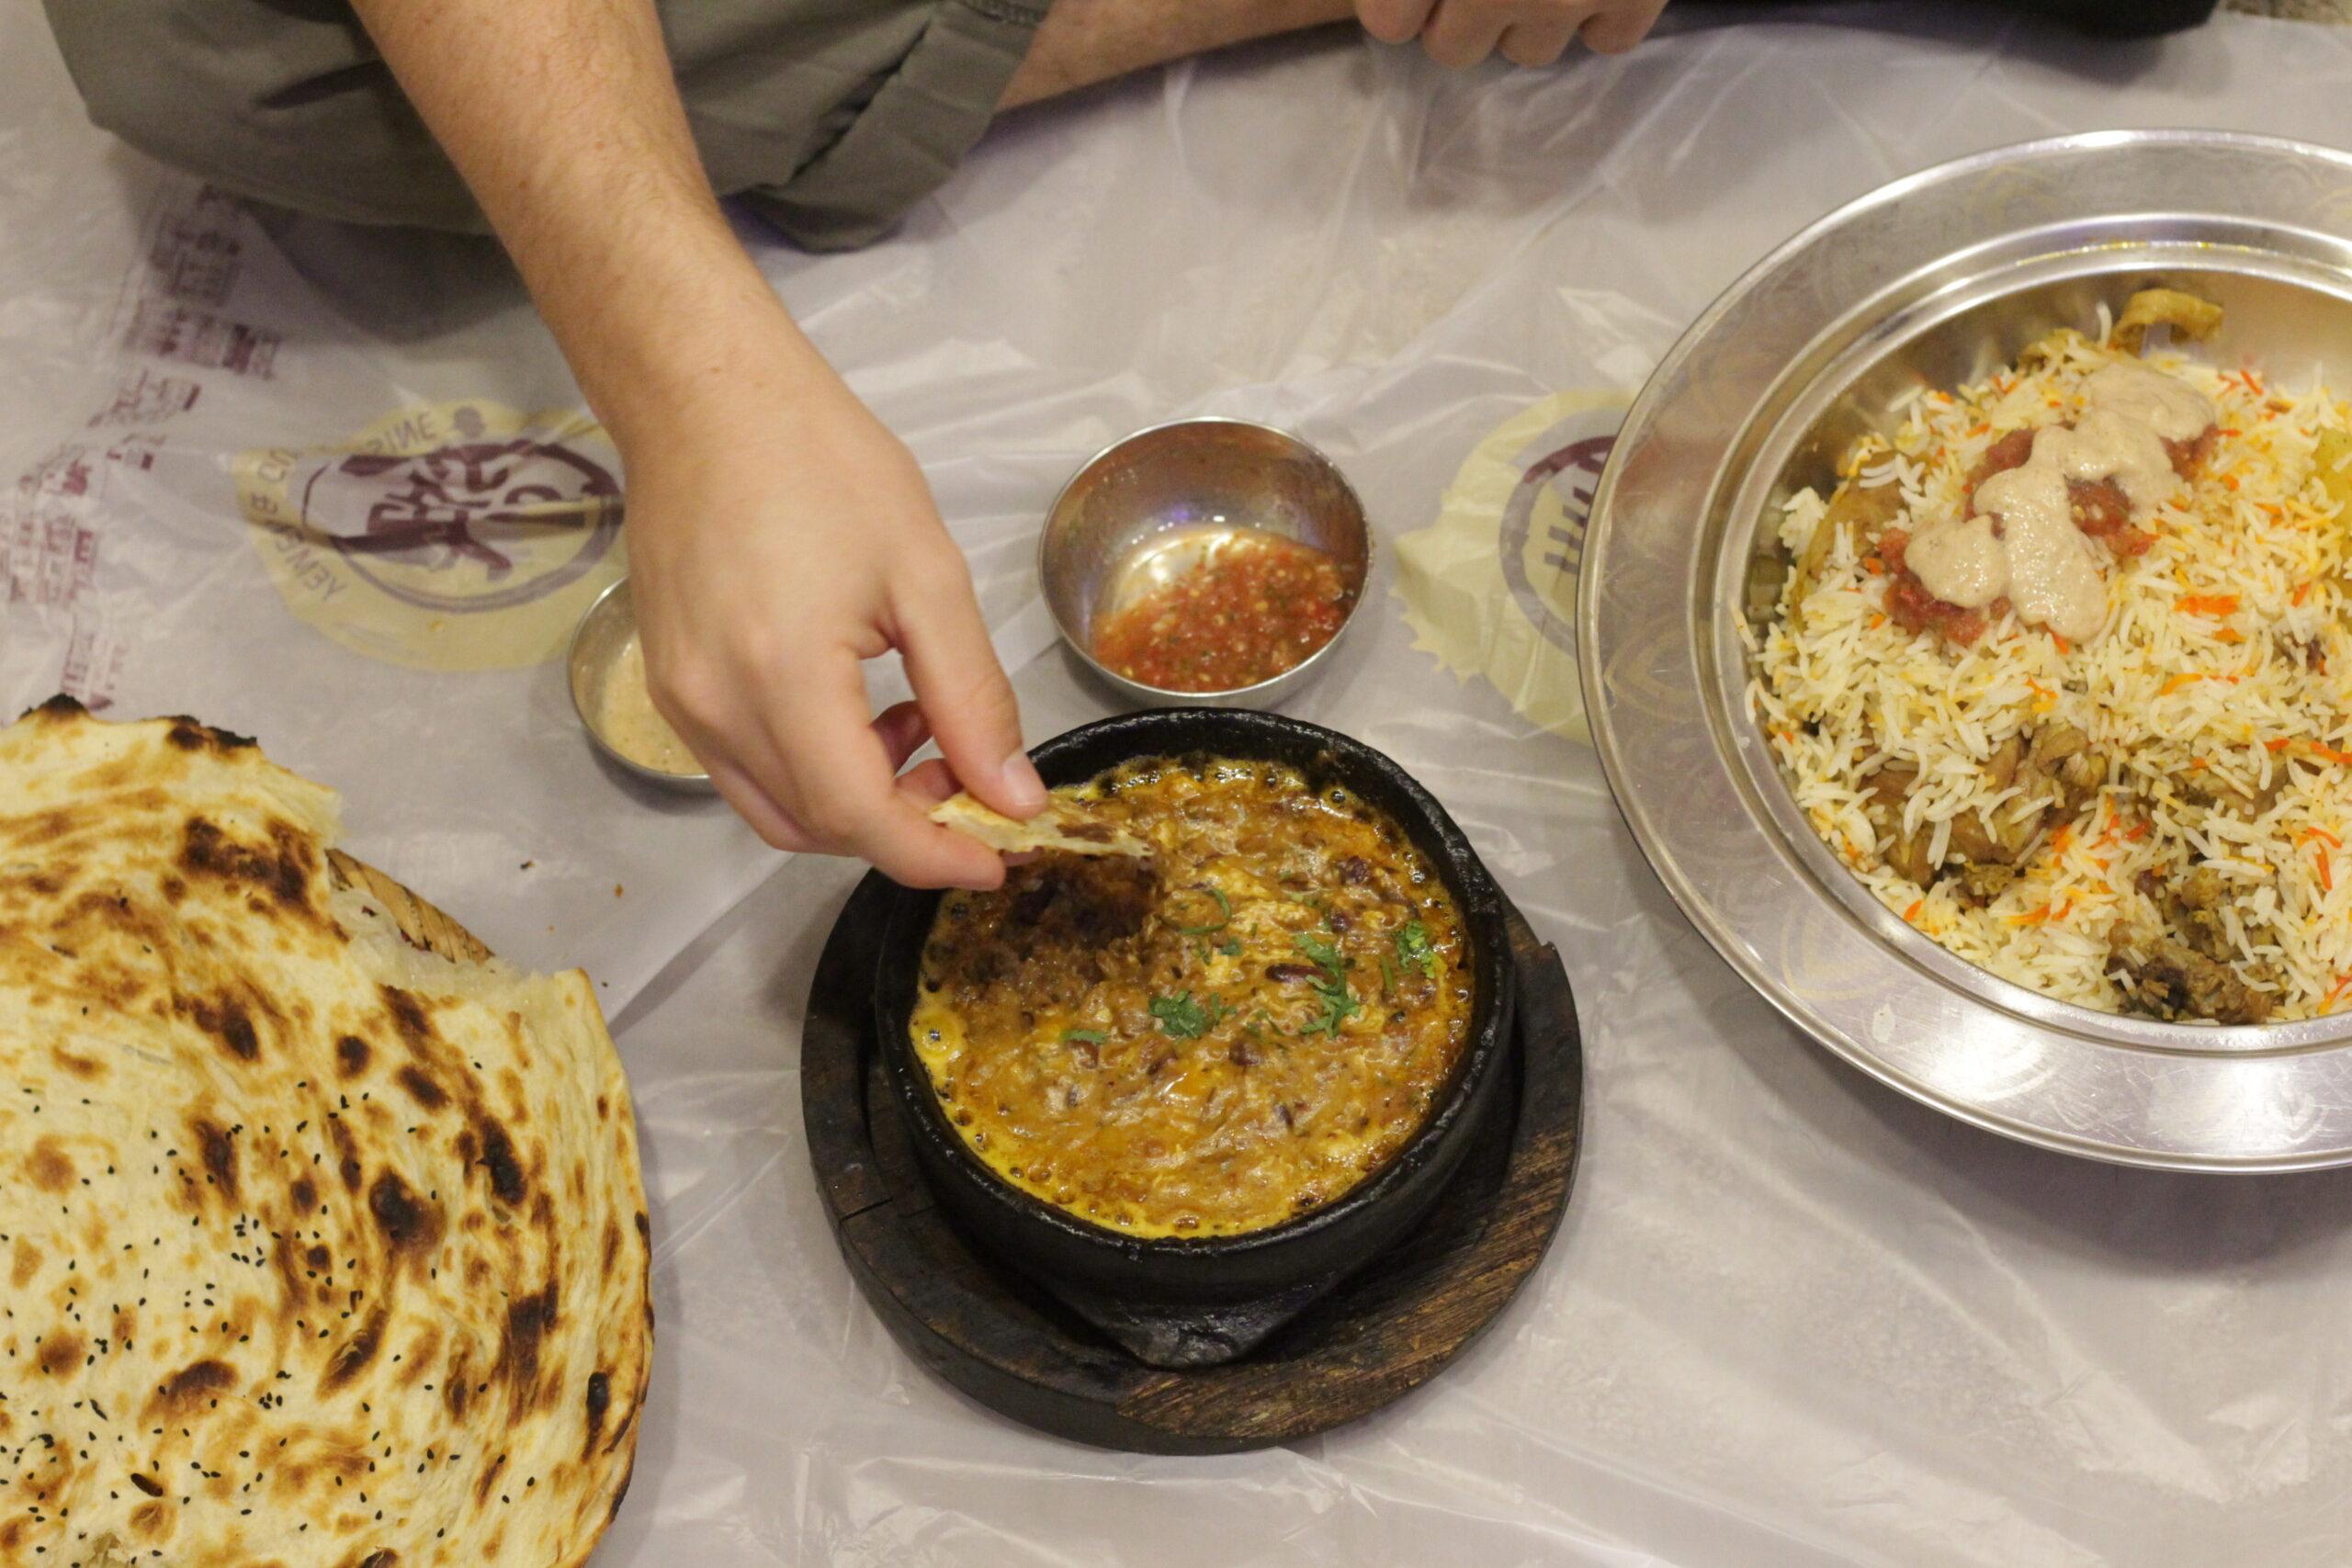 Blog: Breakfast @ Besbas (Yemeni & Gulf cuisine)